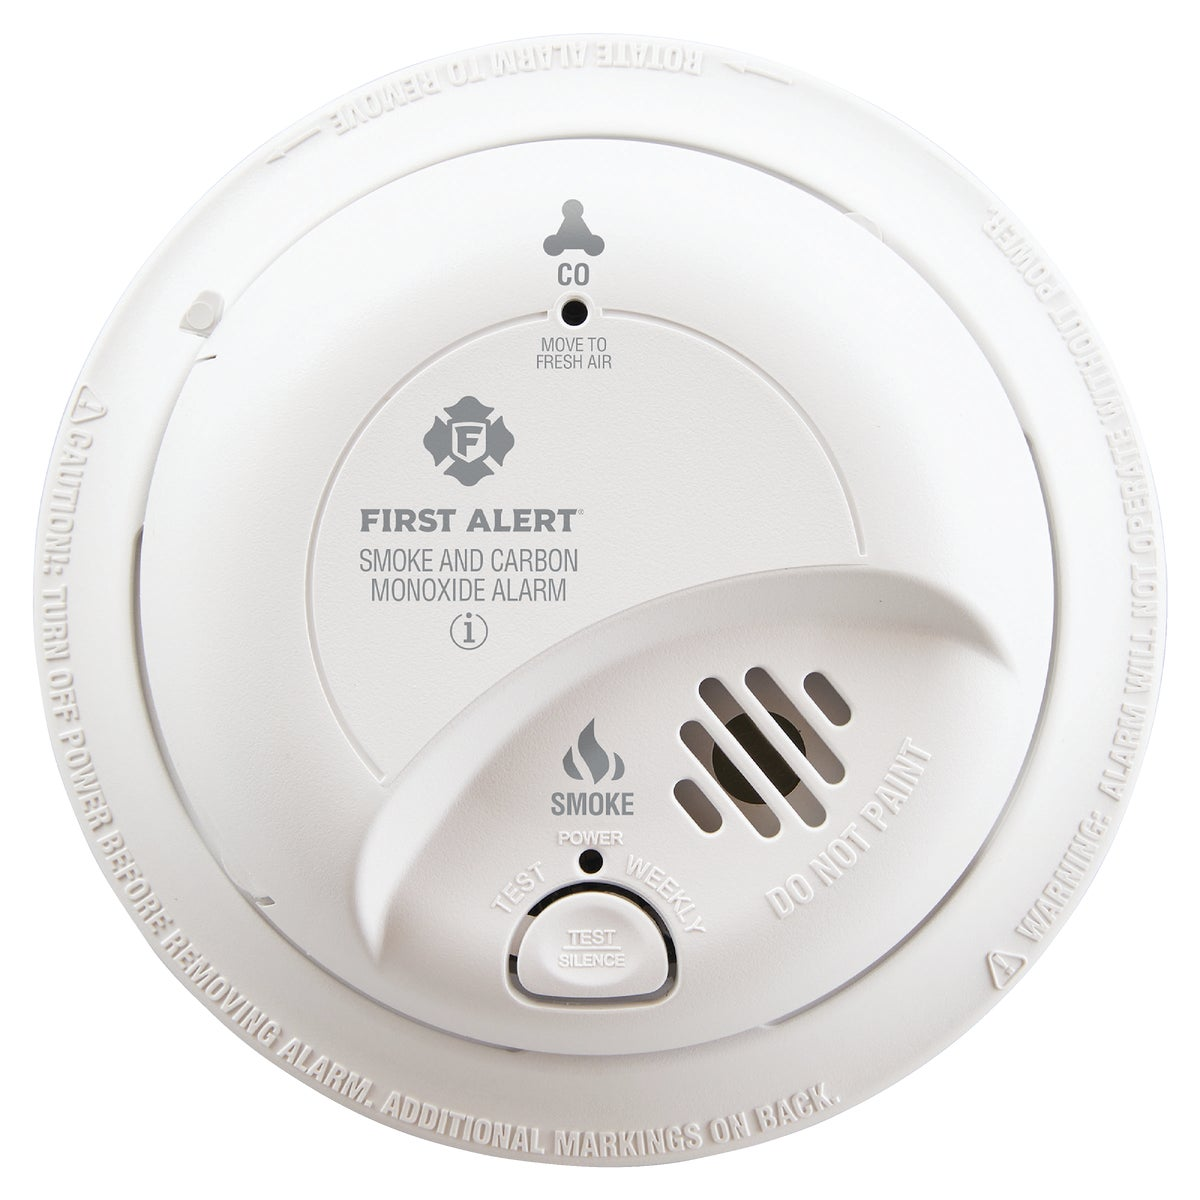 Smoke/Co Alarm